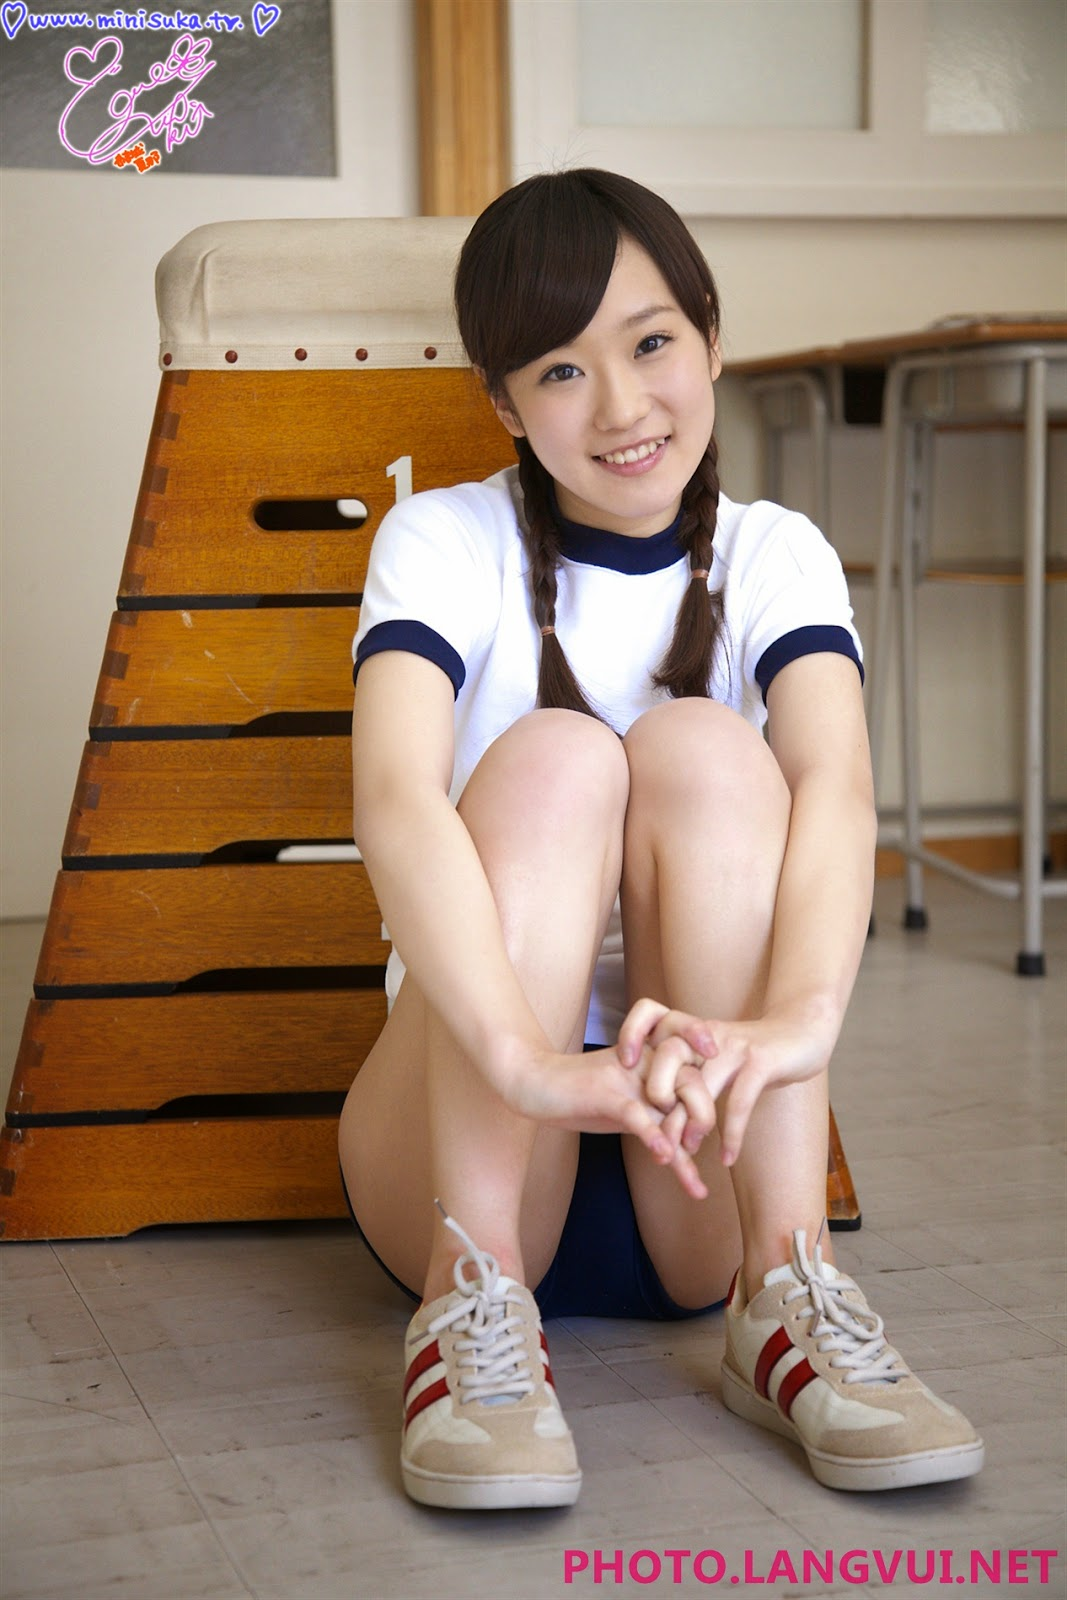 Minisuka kana 04032011 part2